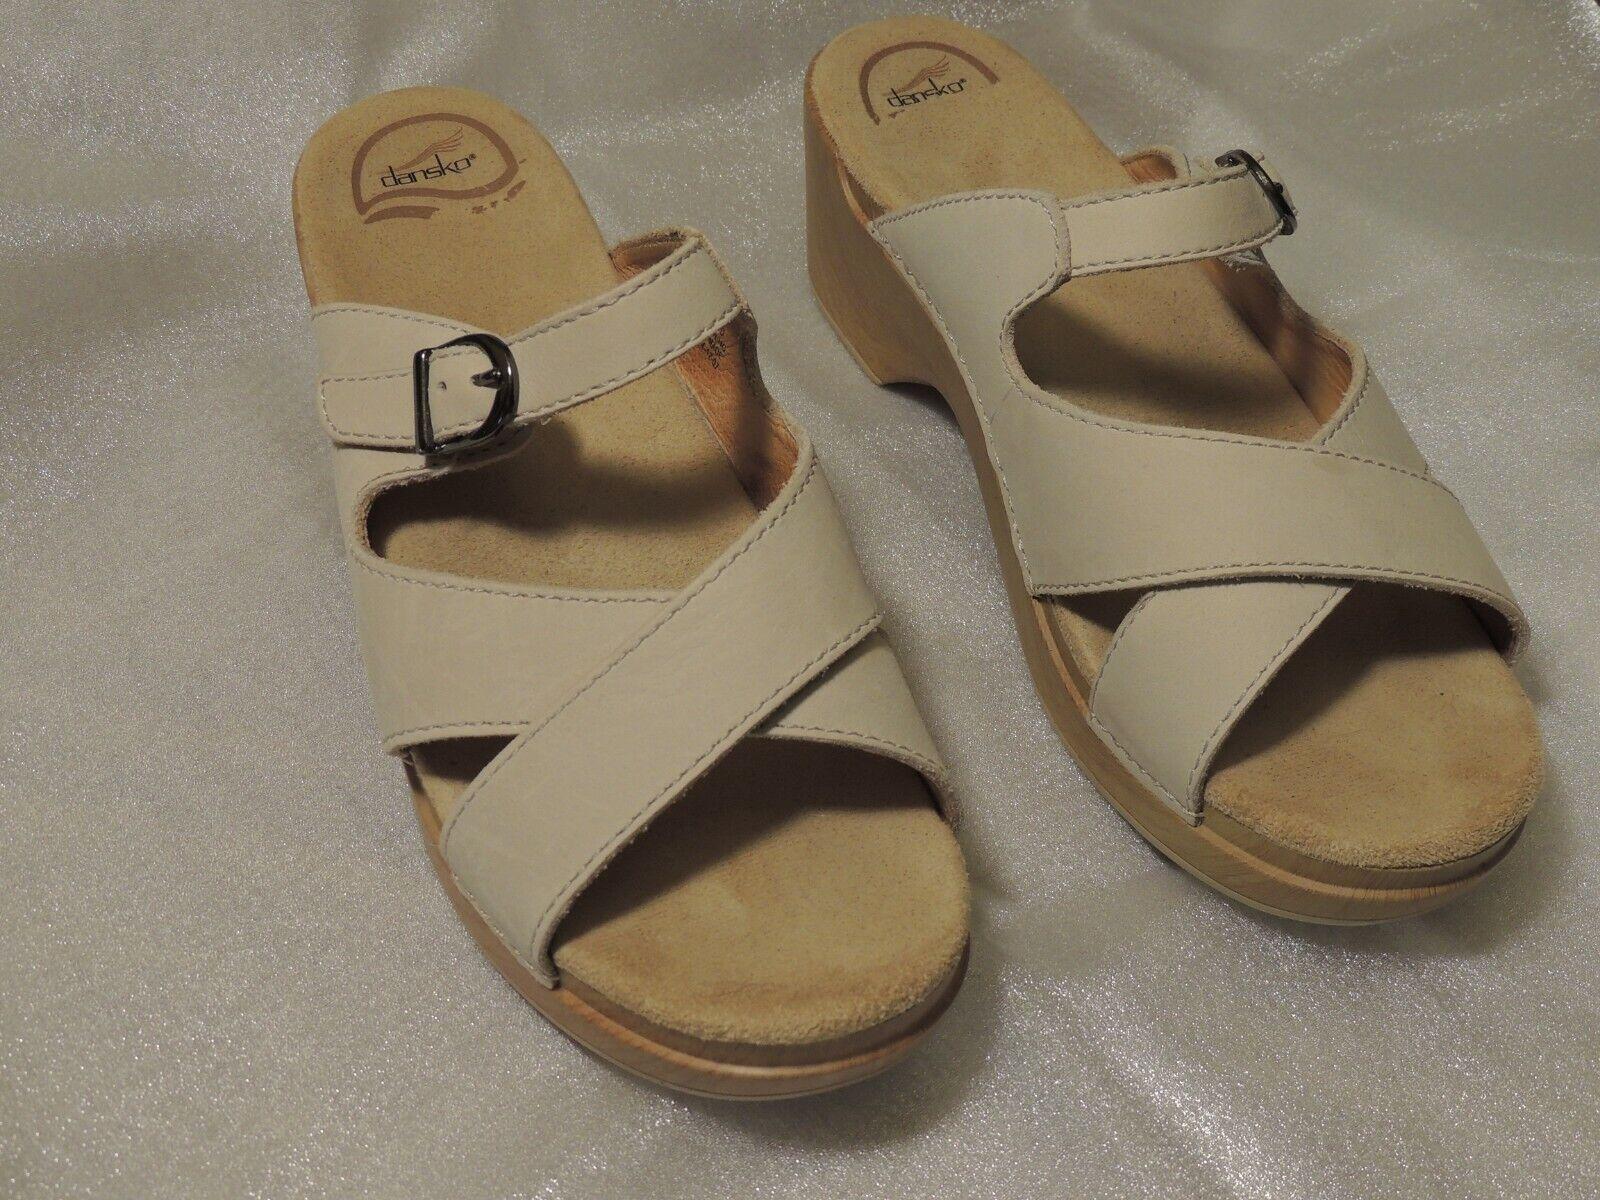 Dansko Leather Sandals Size 40